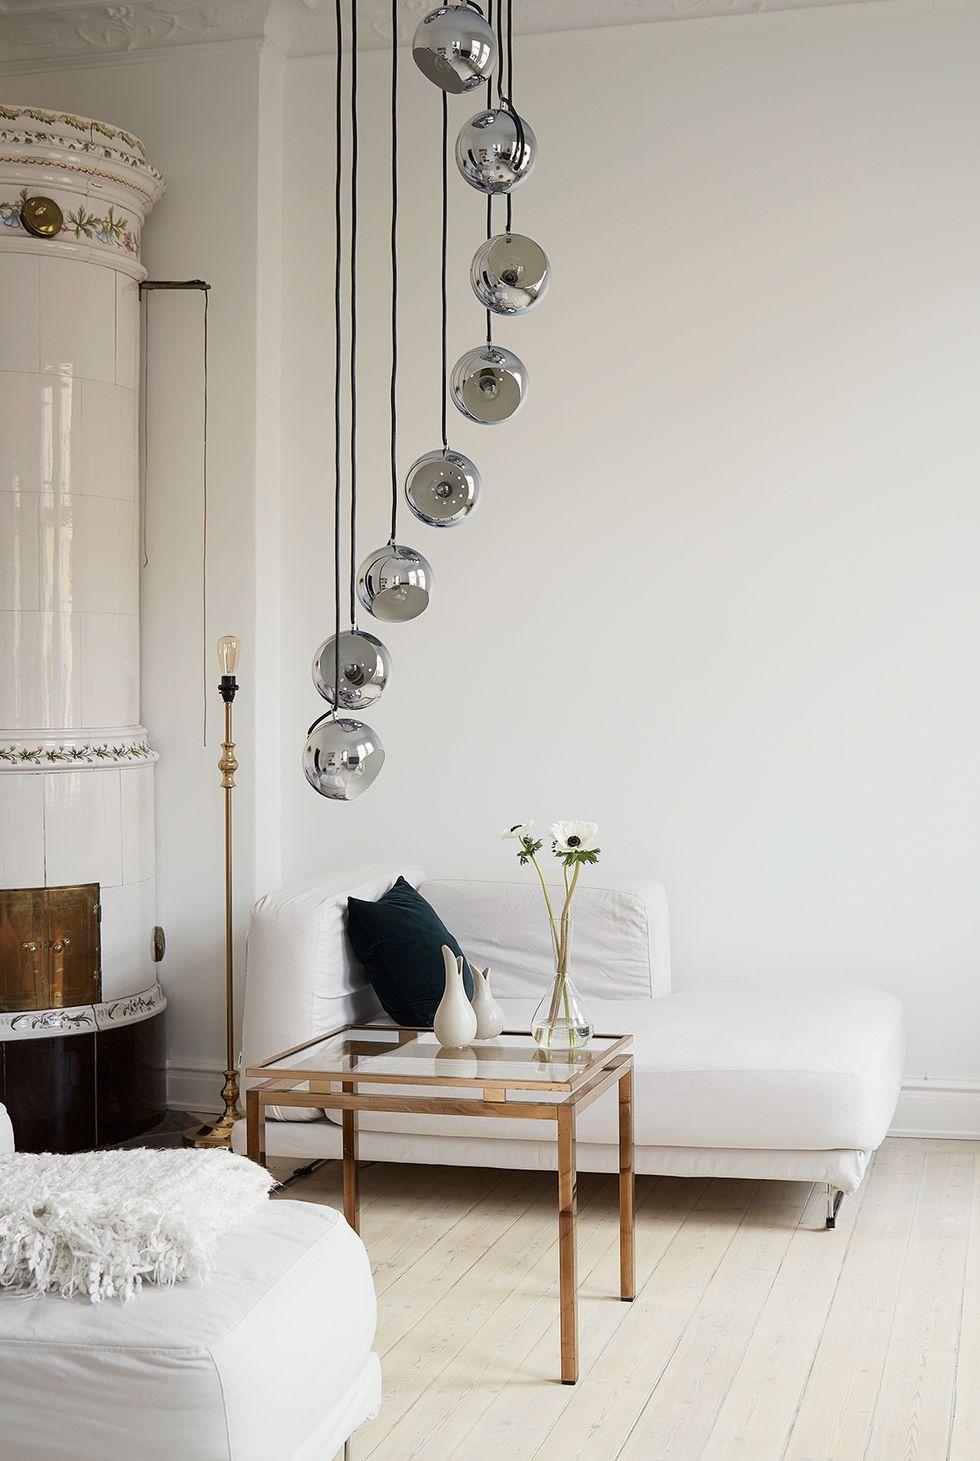 Ameublement de salon minimaliste